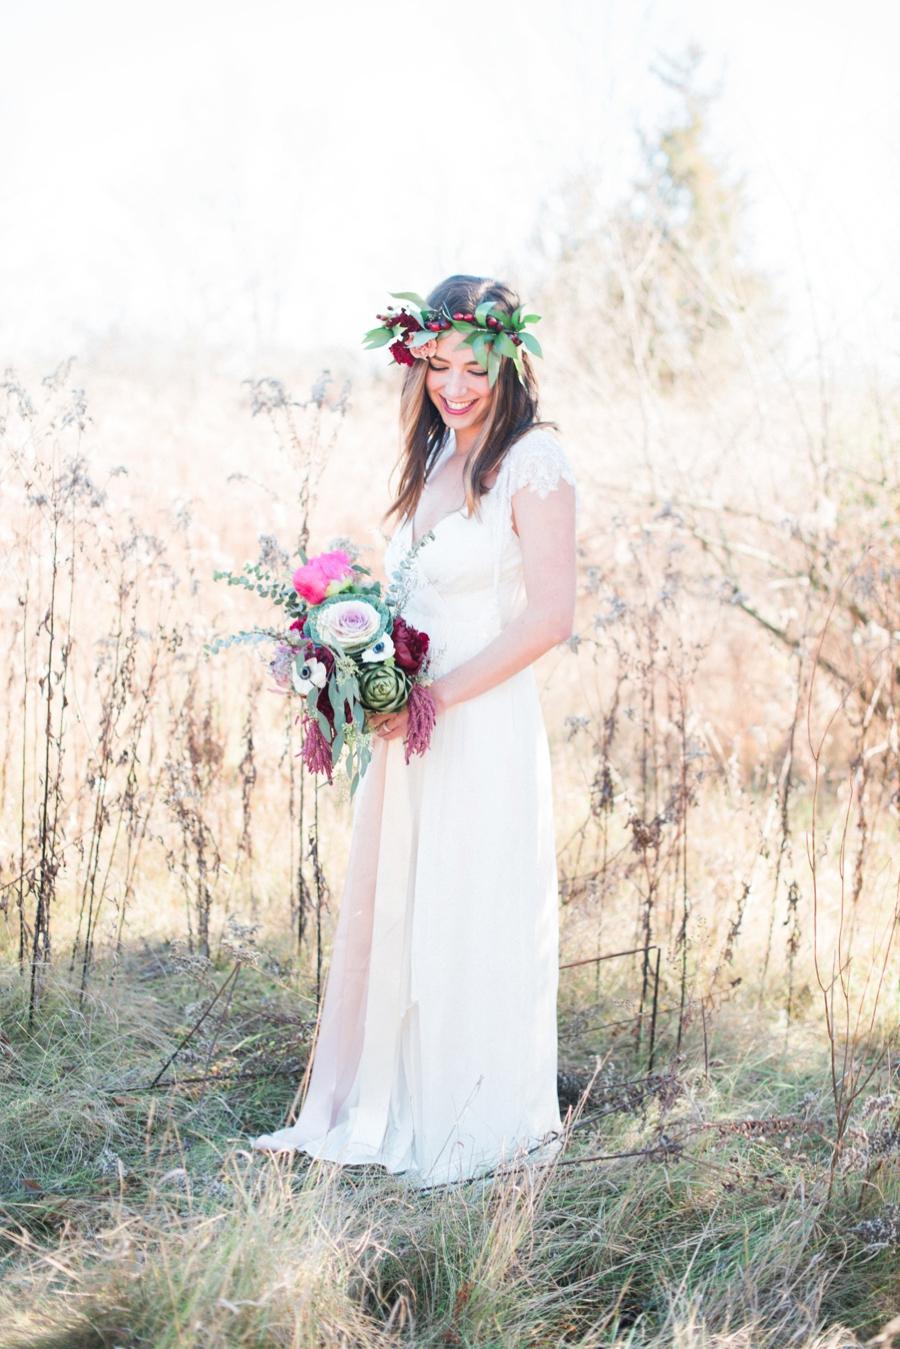 Winter Inspired Boho Chic Wedding Ideas via TheELD.com